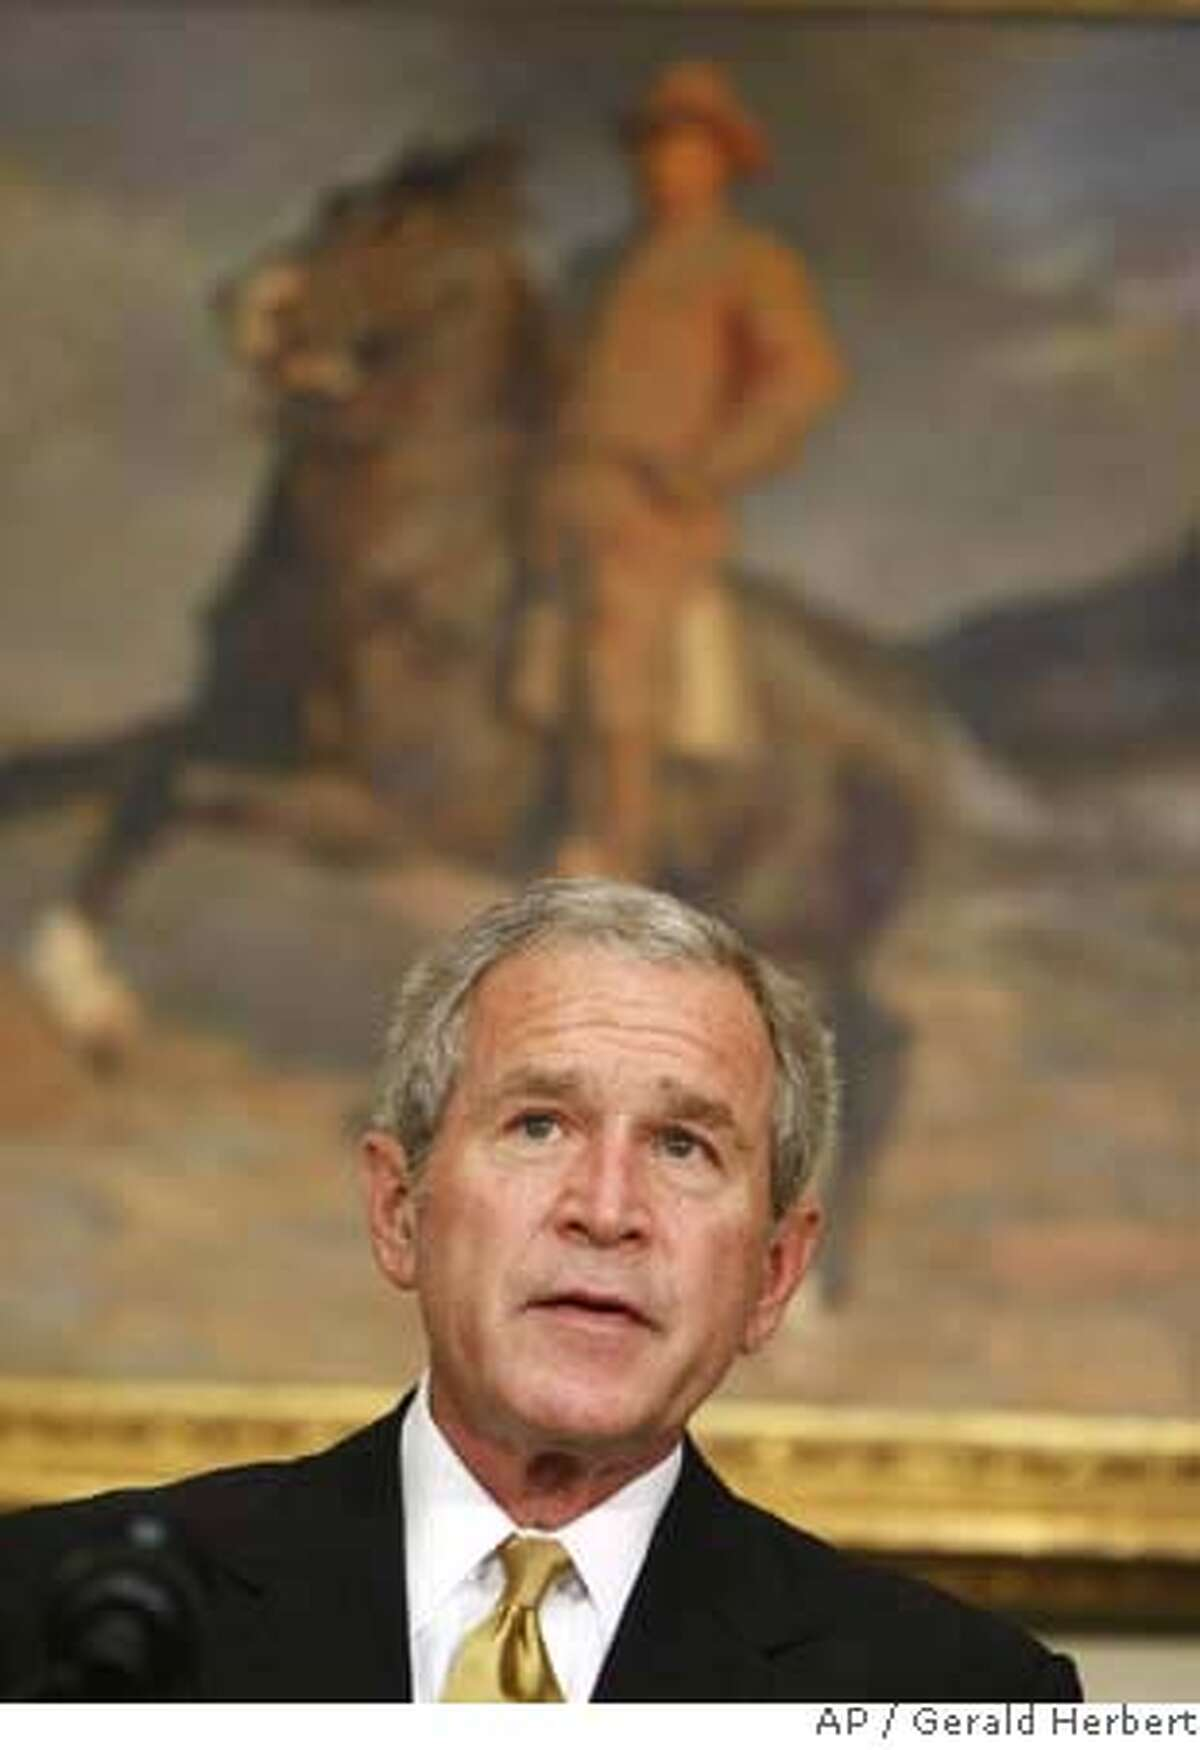 President Bush makes remarks on health care, Wednesday, June 27, 2007, in the Roosevelt Room of the White House in Washington. (AP Photo/Gerald Herbert)